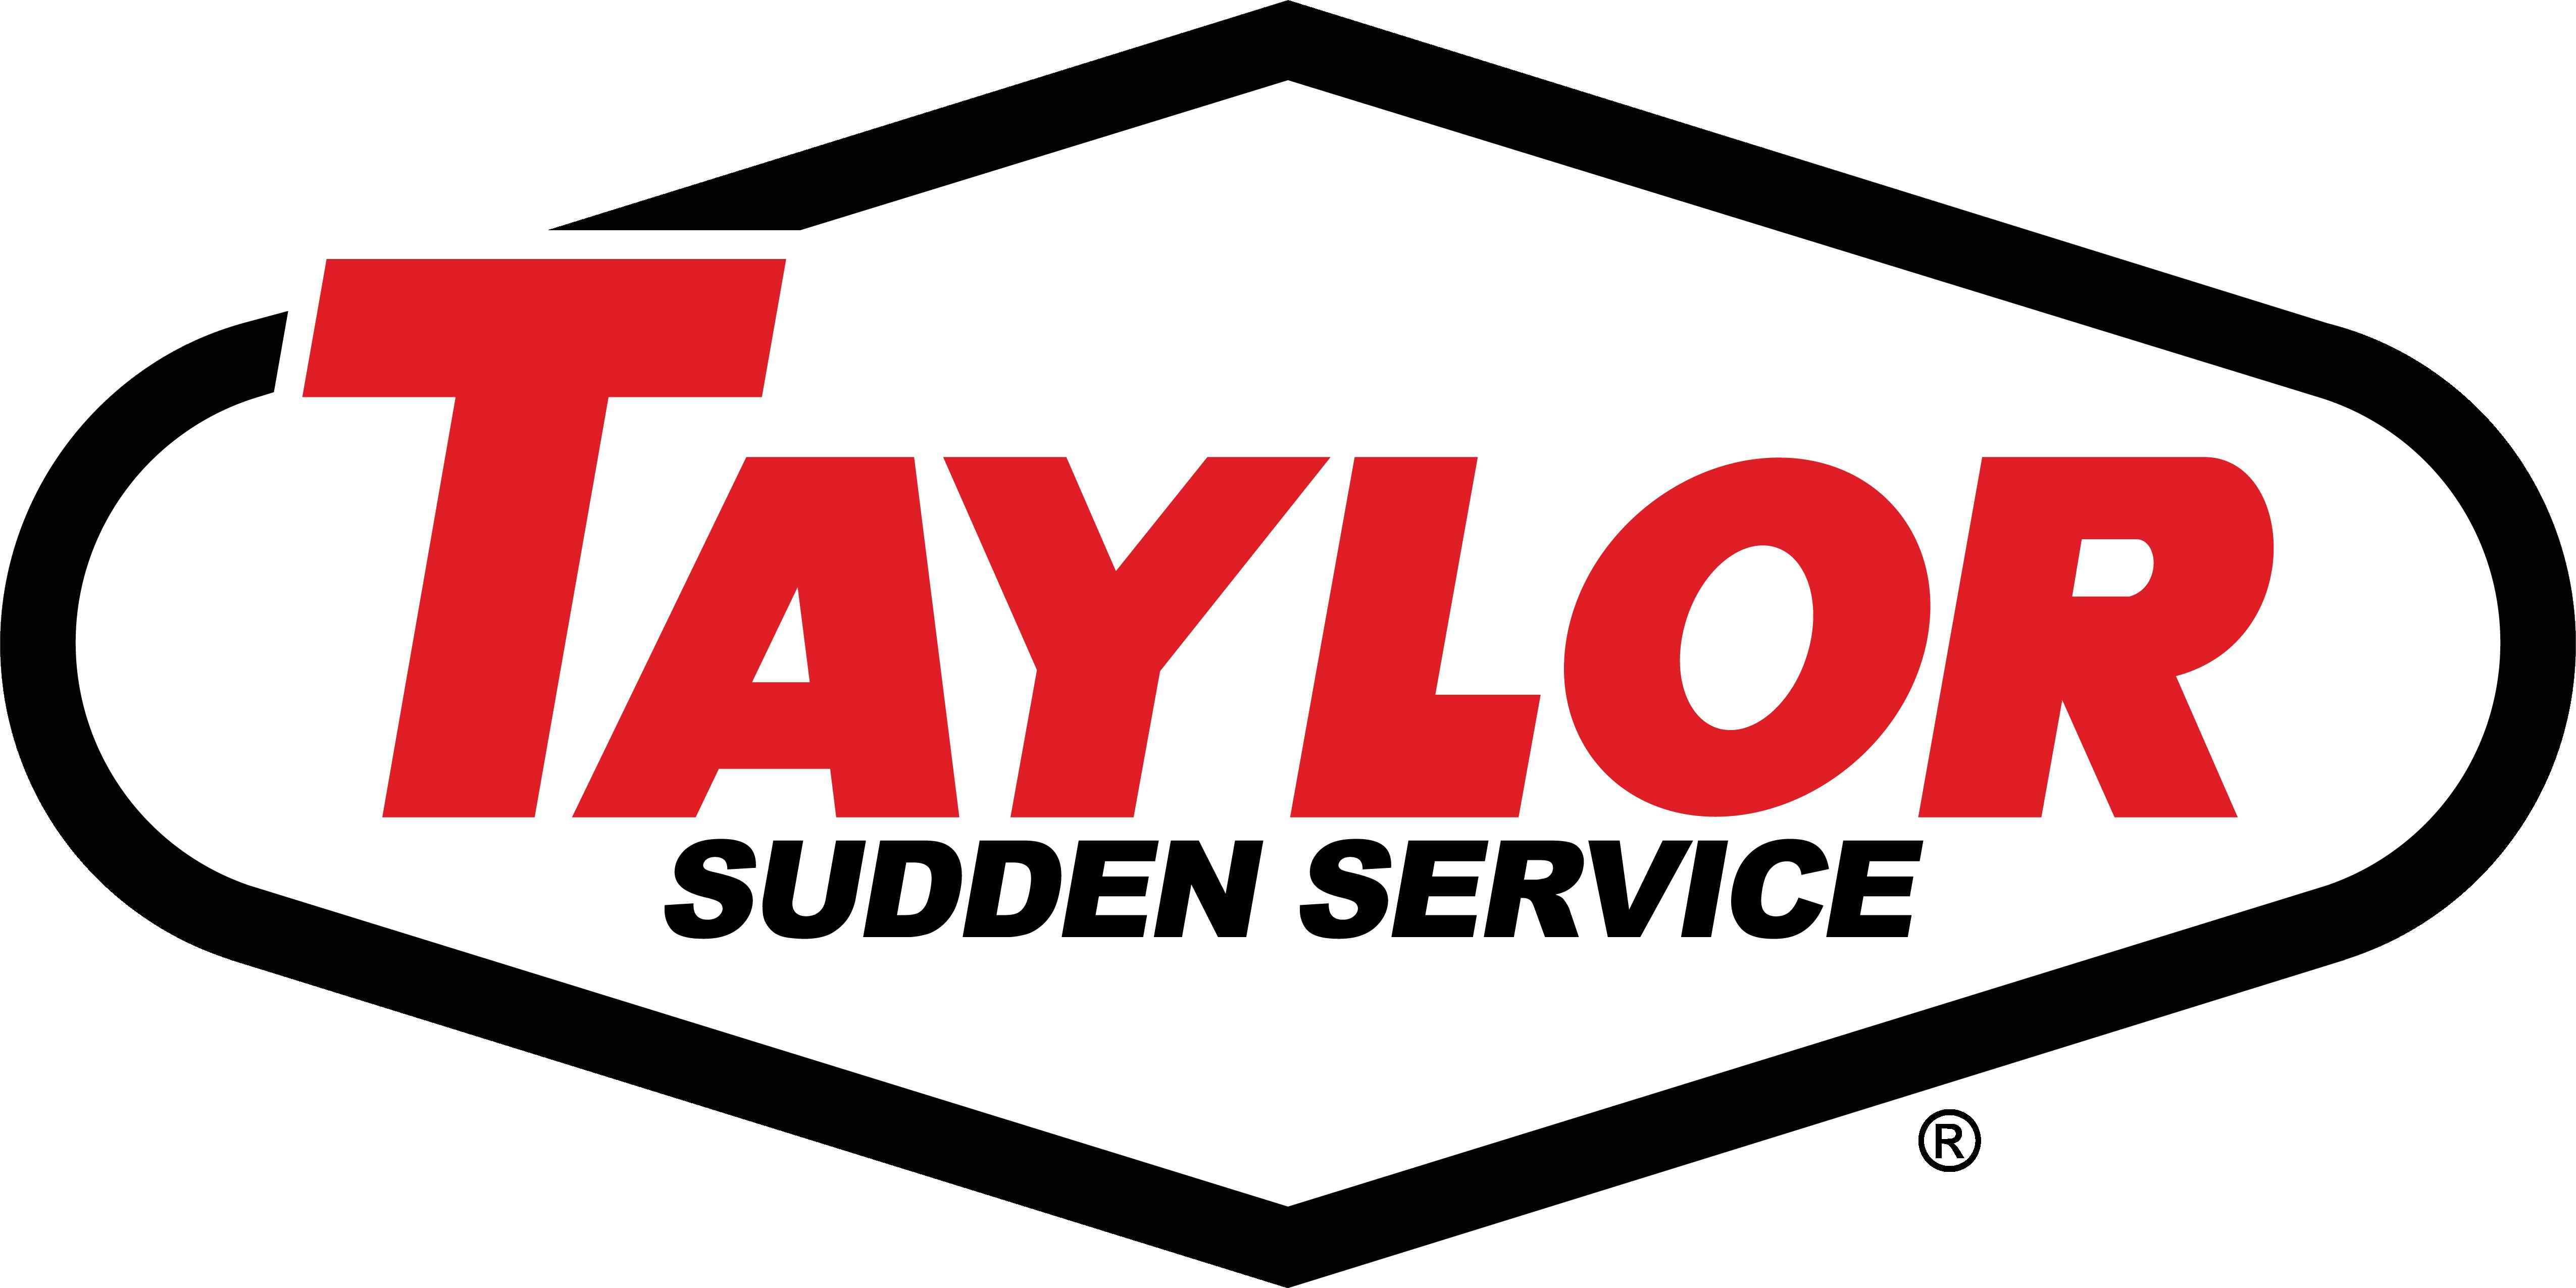 Taylor Sudden Service